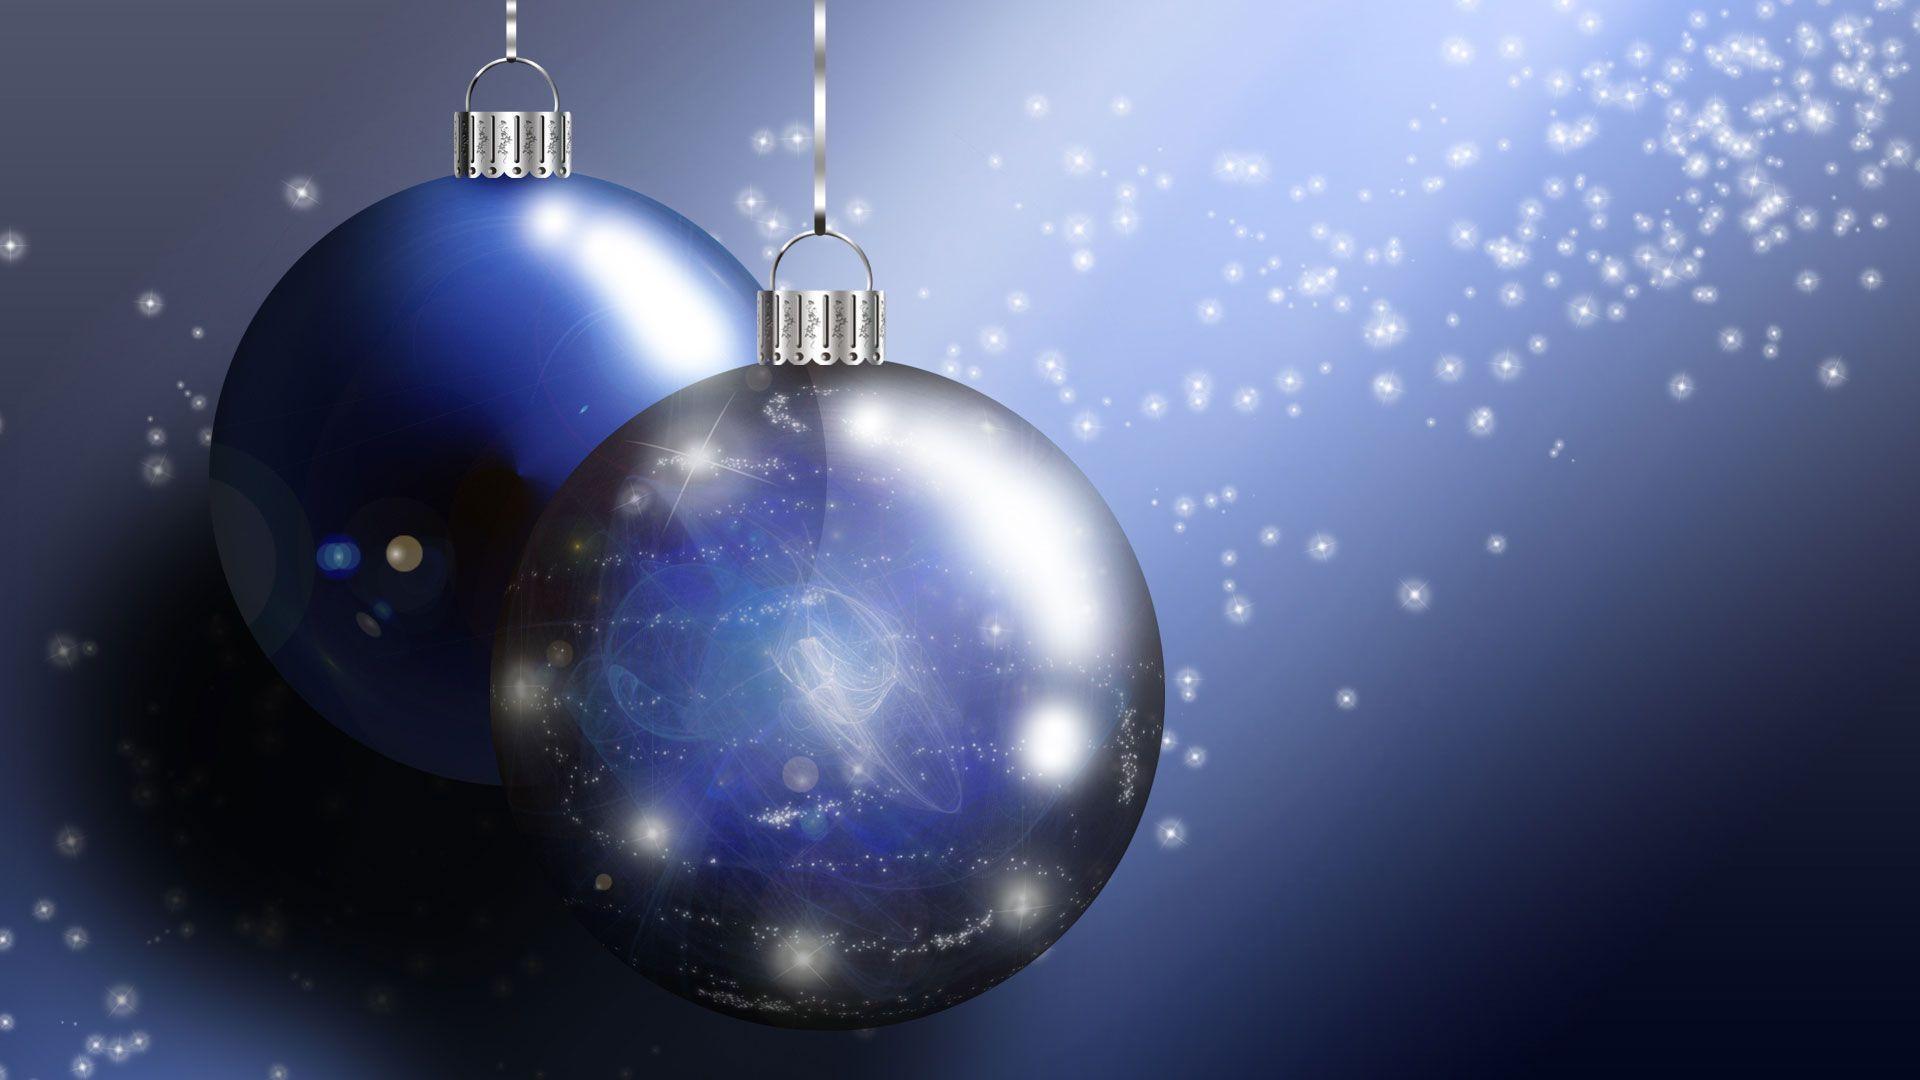 christmas ornaments wallpaper 8026 - photo #6